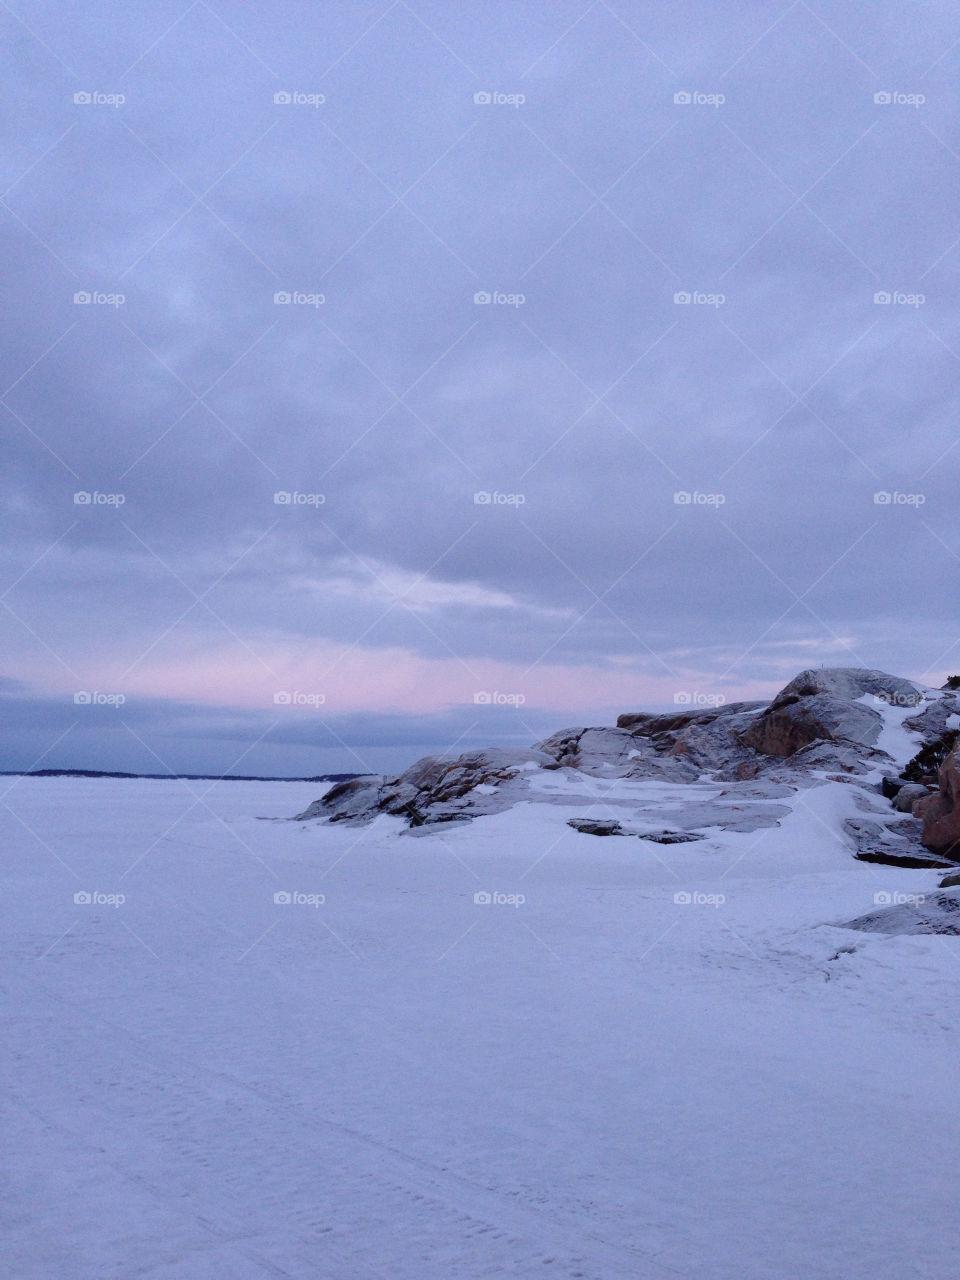 Beautiful Morning Winter Walk